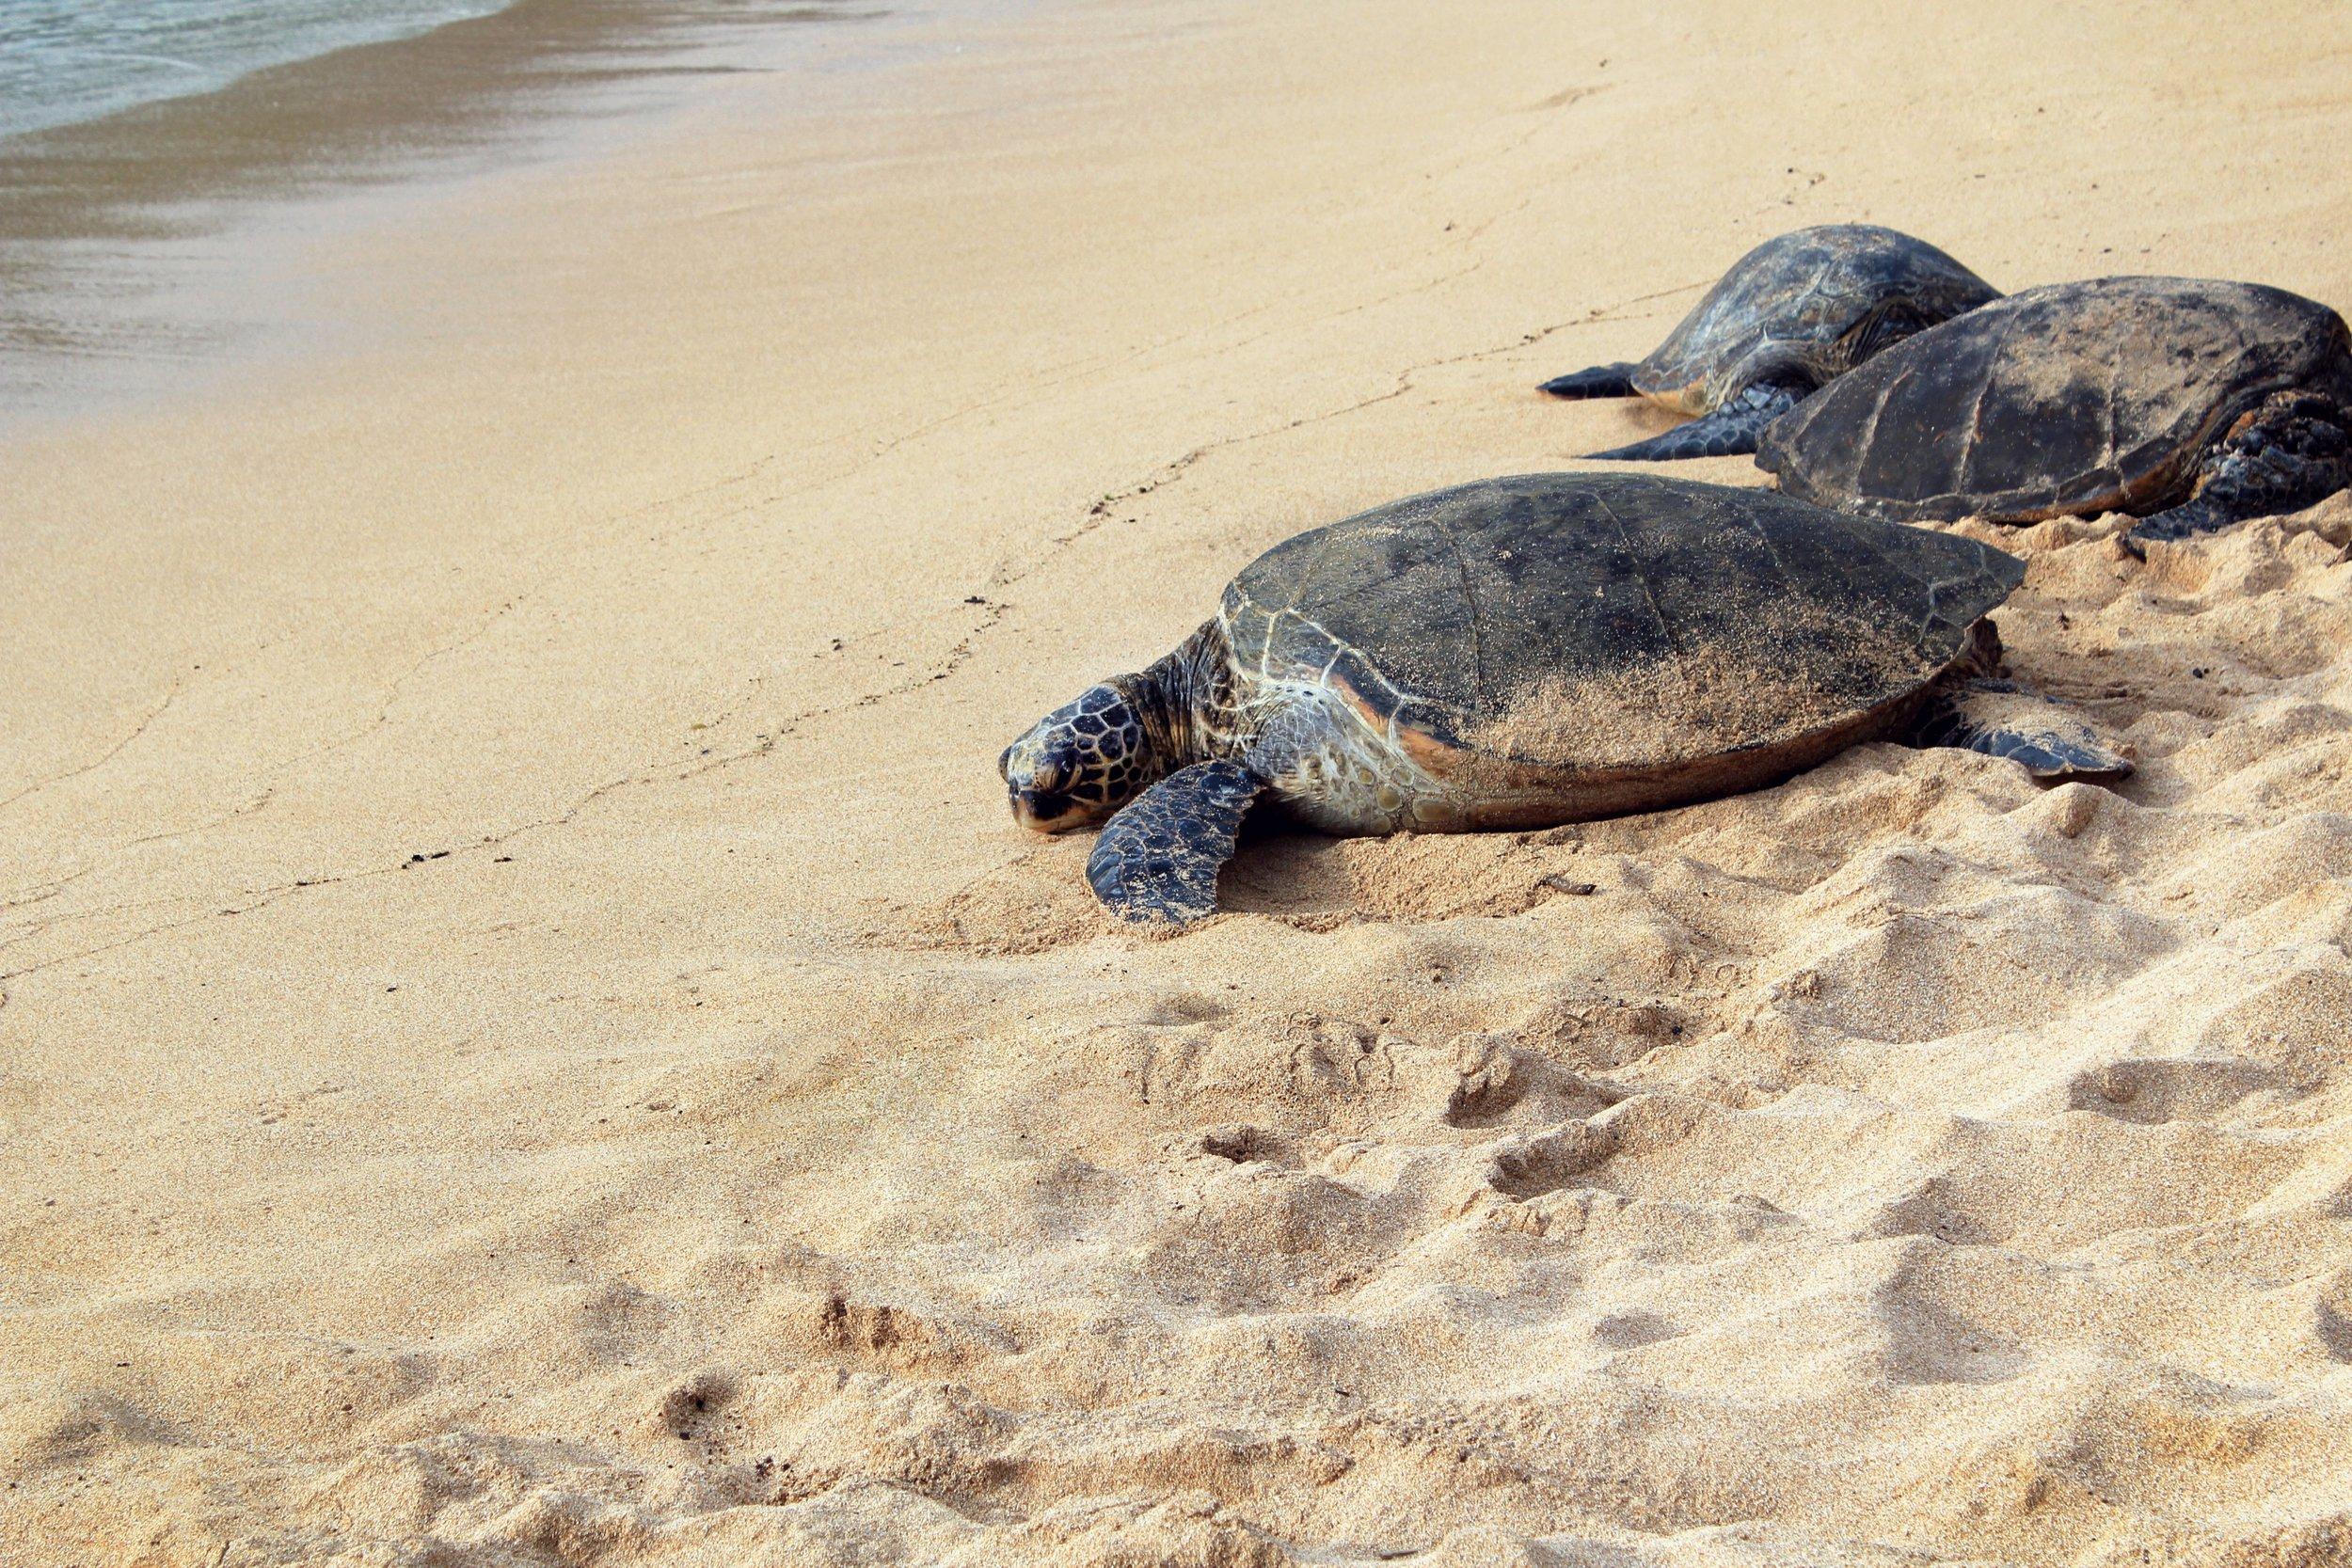 Turtles on a beach